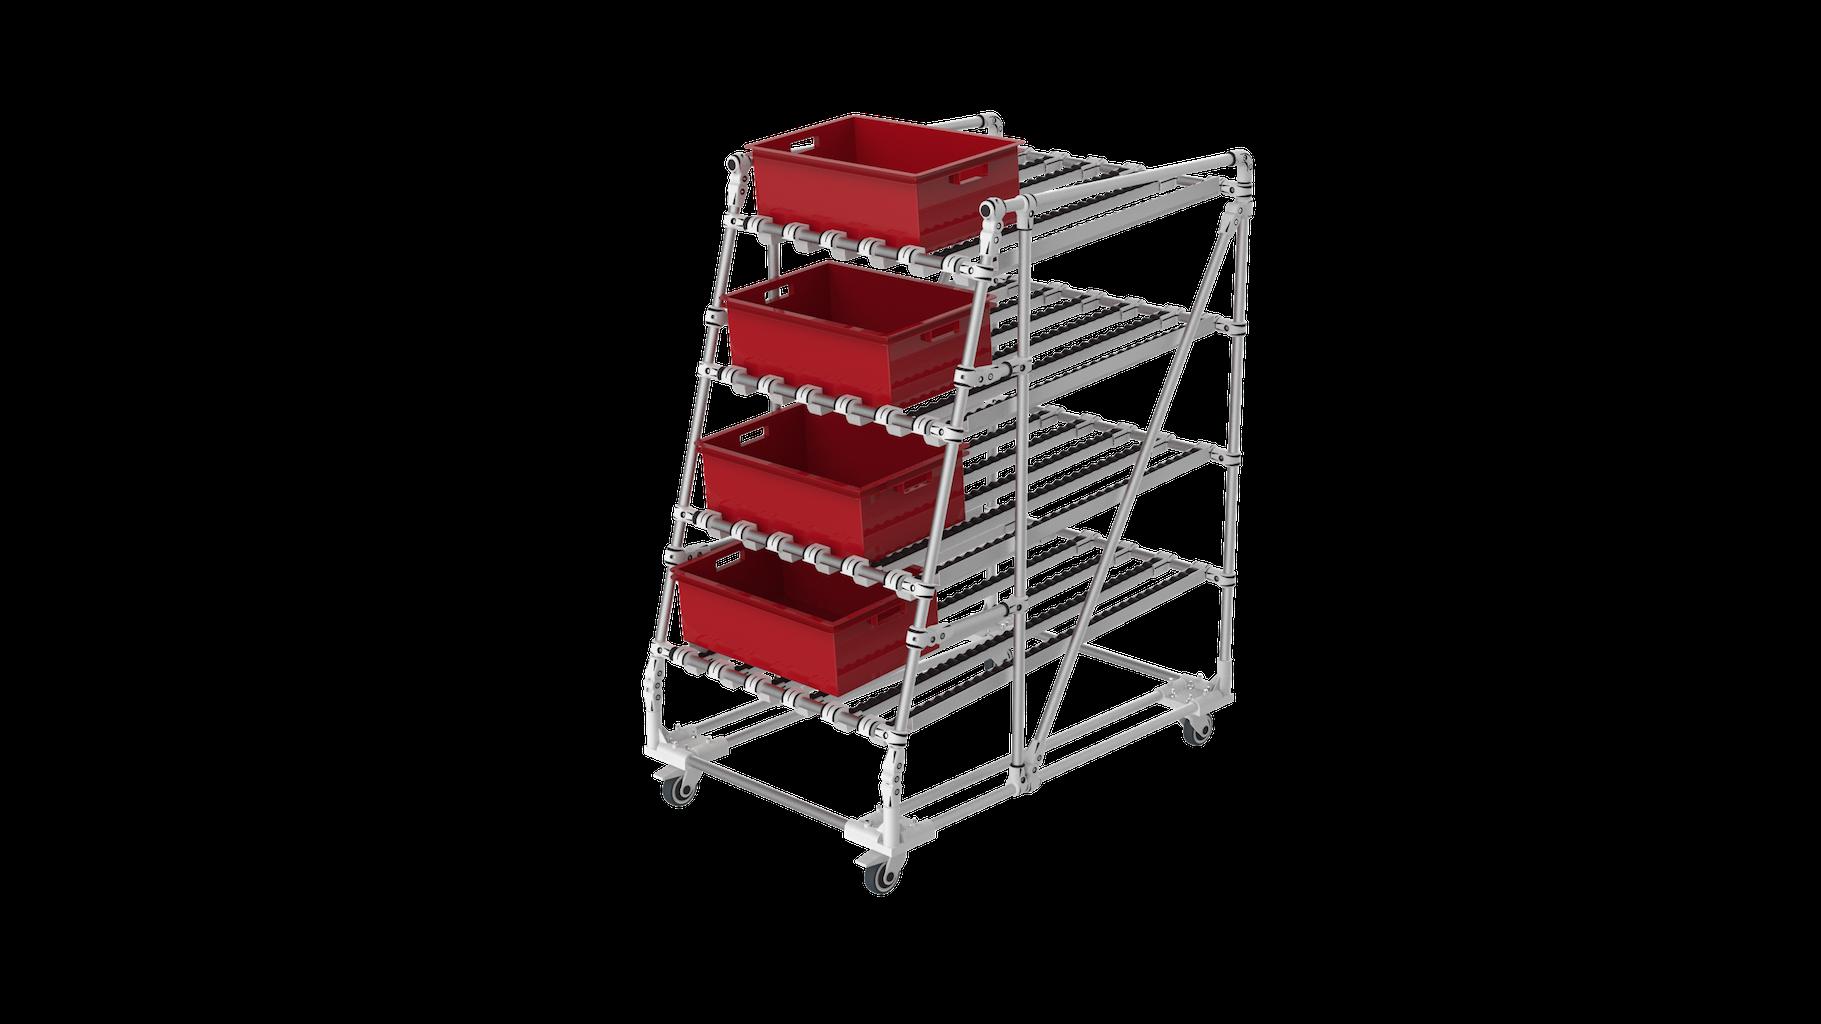 Ergonomic FIFO flow rack